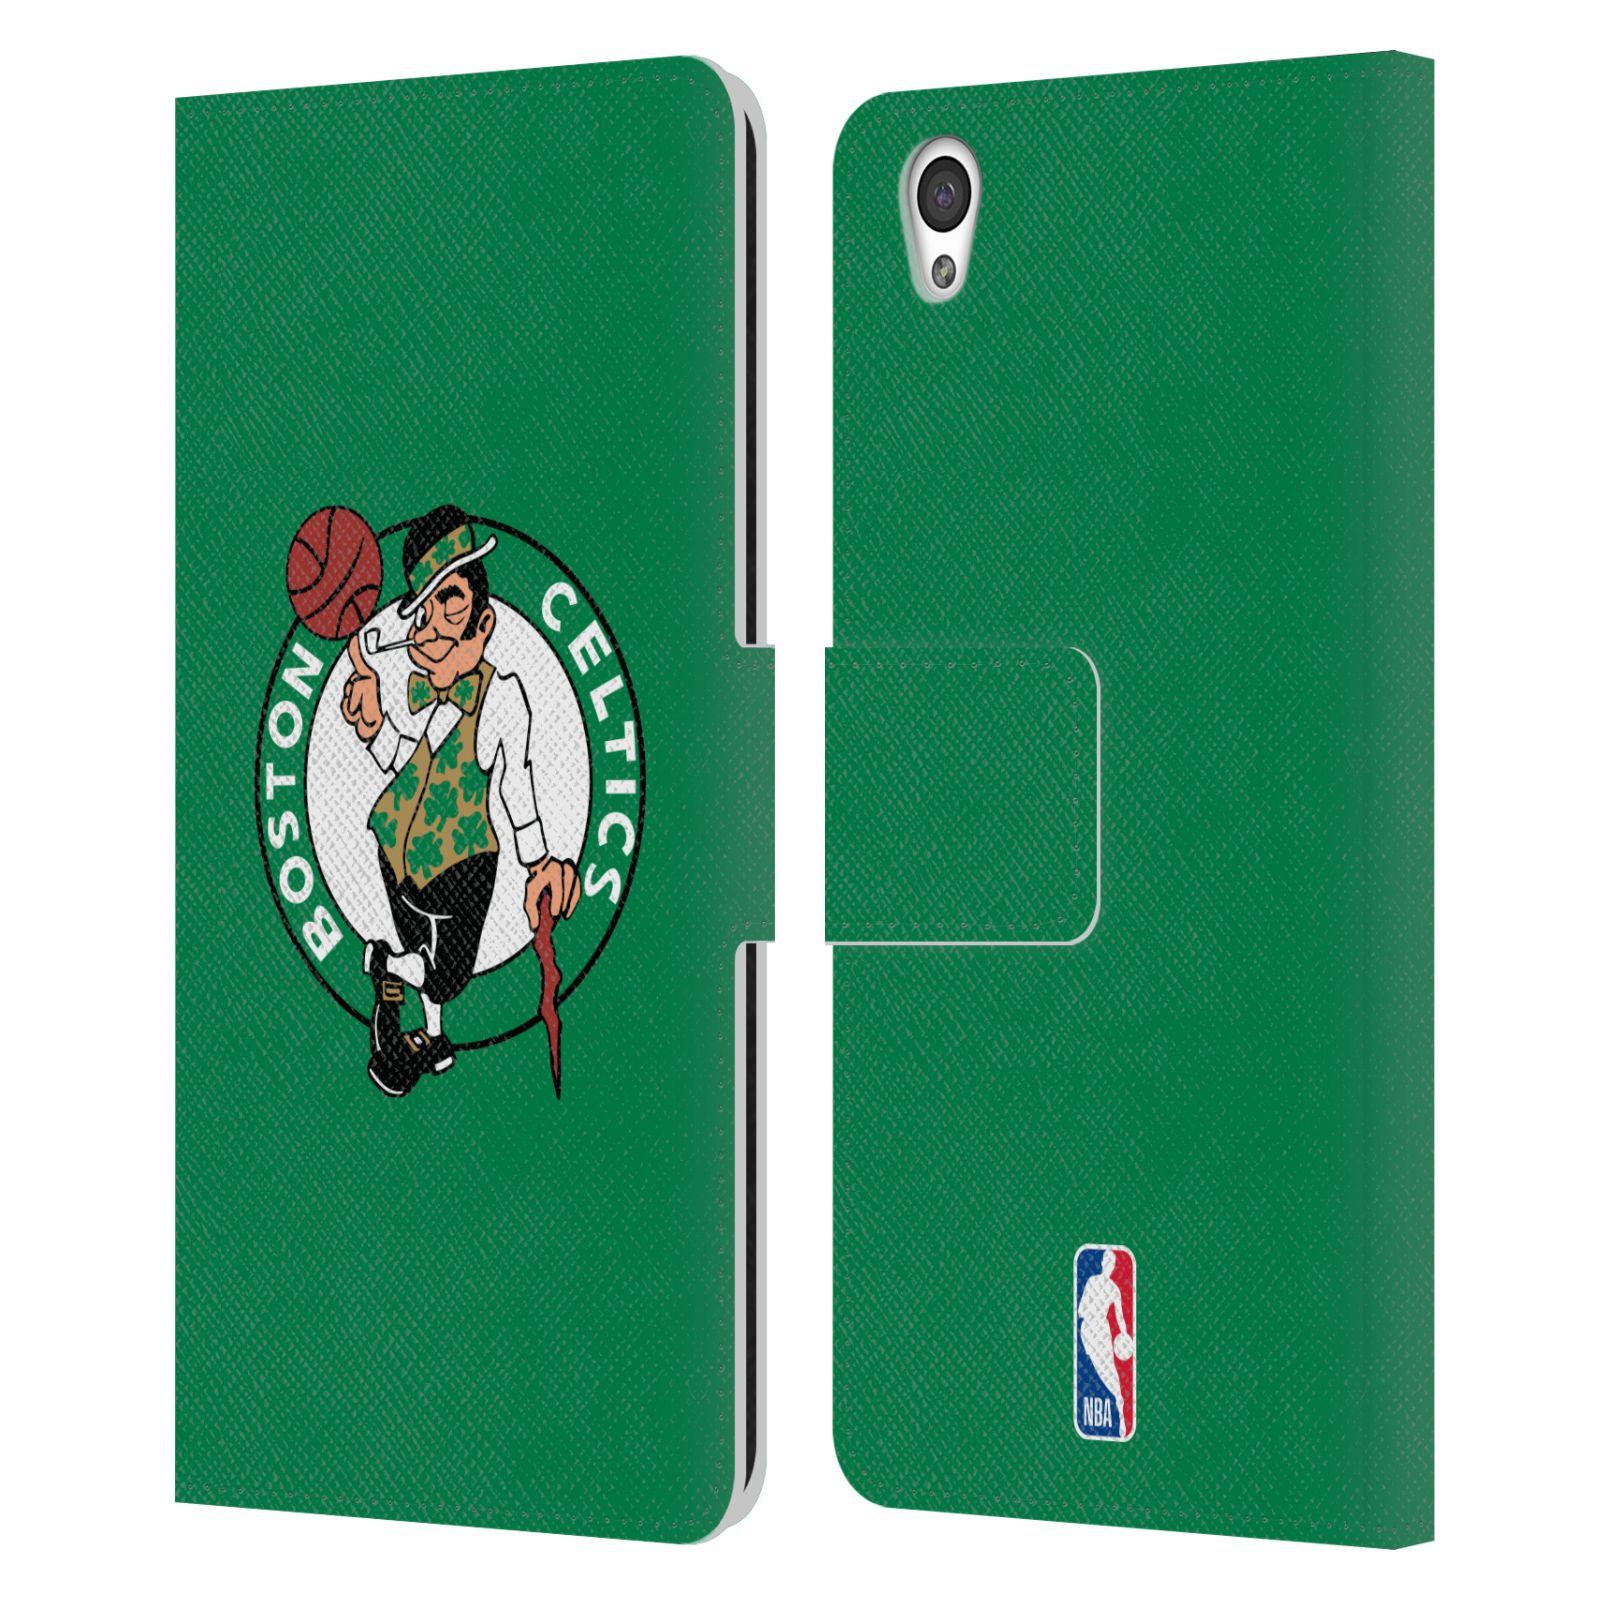 Pouzdro na mobil OnePlus X - Head Case - NBA - Boston Celtics zelená barva znak